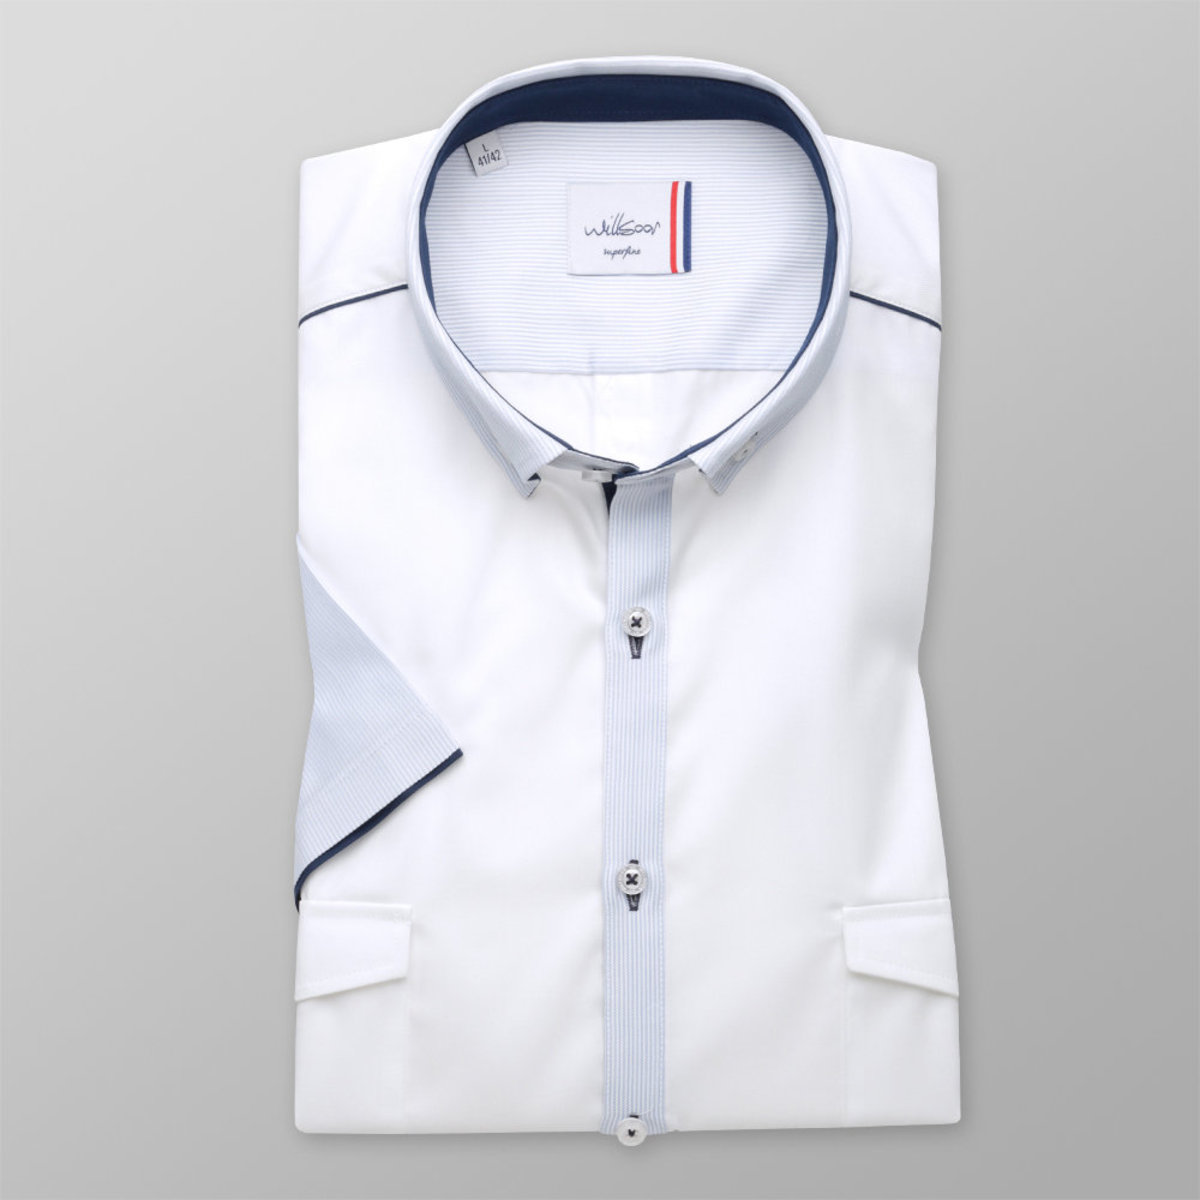 Košeľa Slim Fit biela s modrými prvkami (výška 176 - 182) 10874 176-182 / L (41/42)